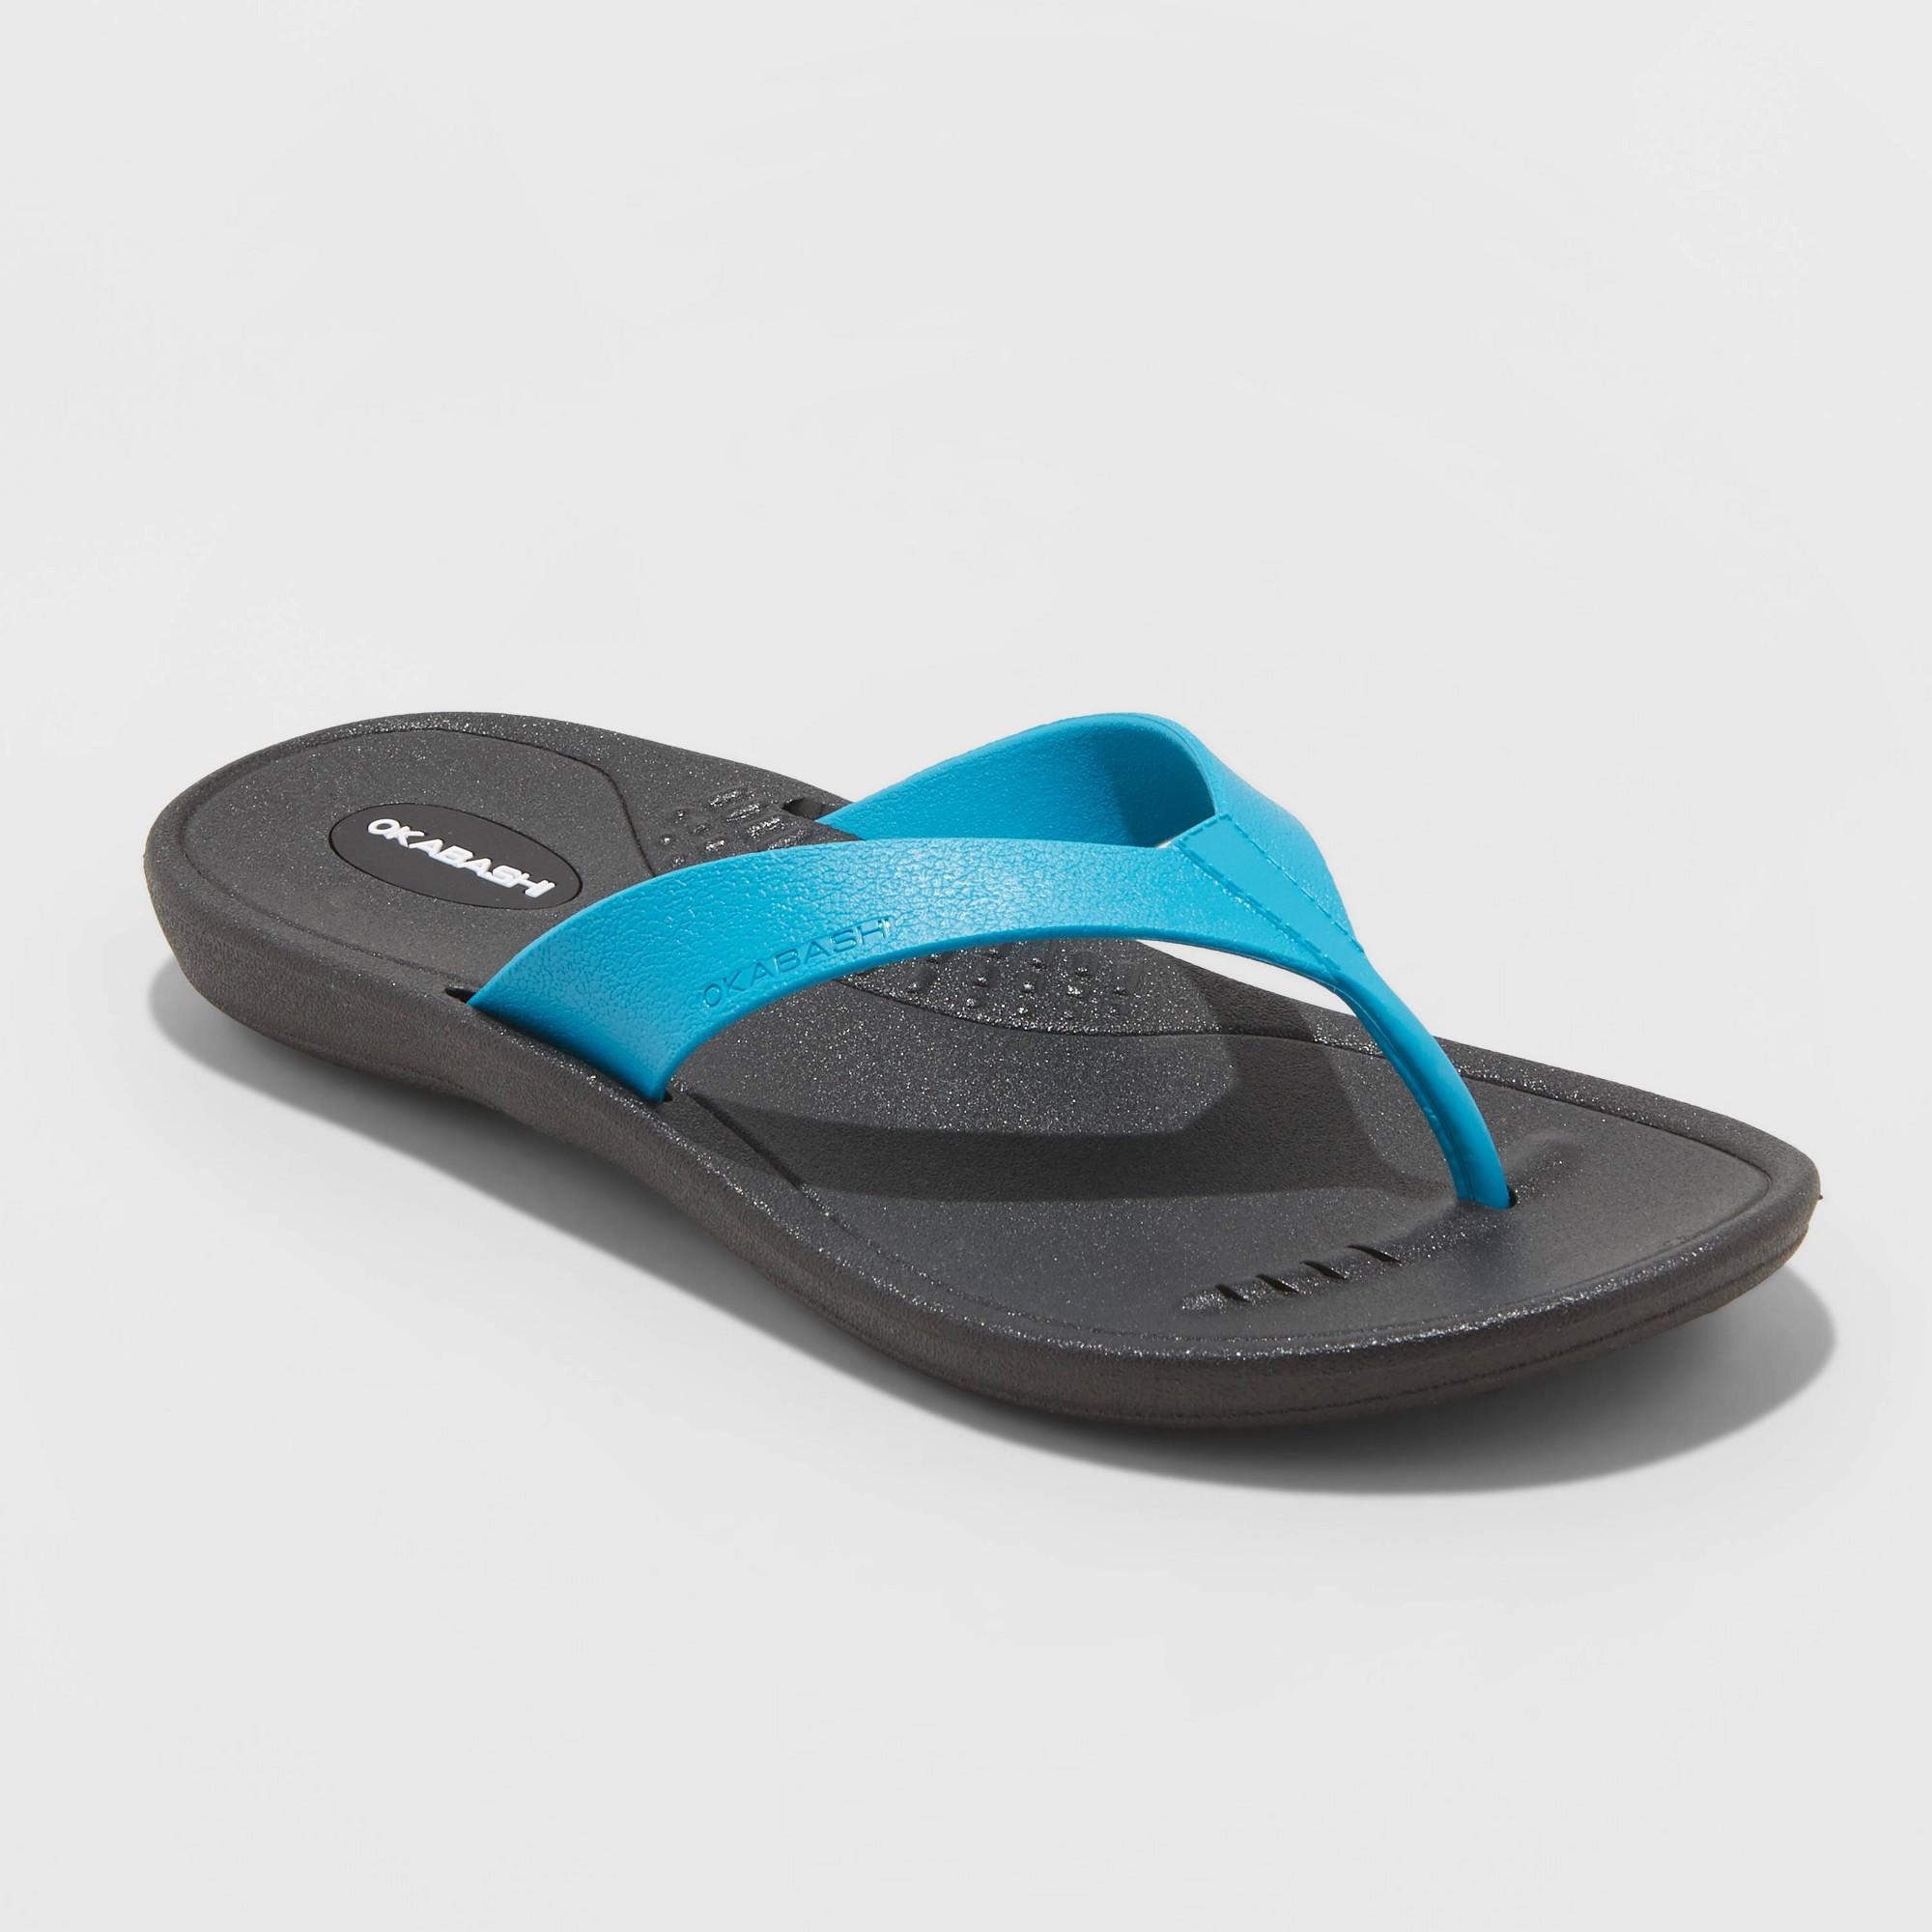 Women's Breeze Flip Flop Sandals - Okabashi - Turquoise XL(11-12)